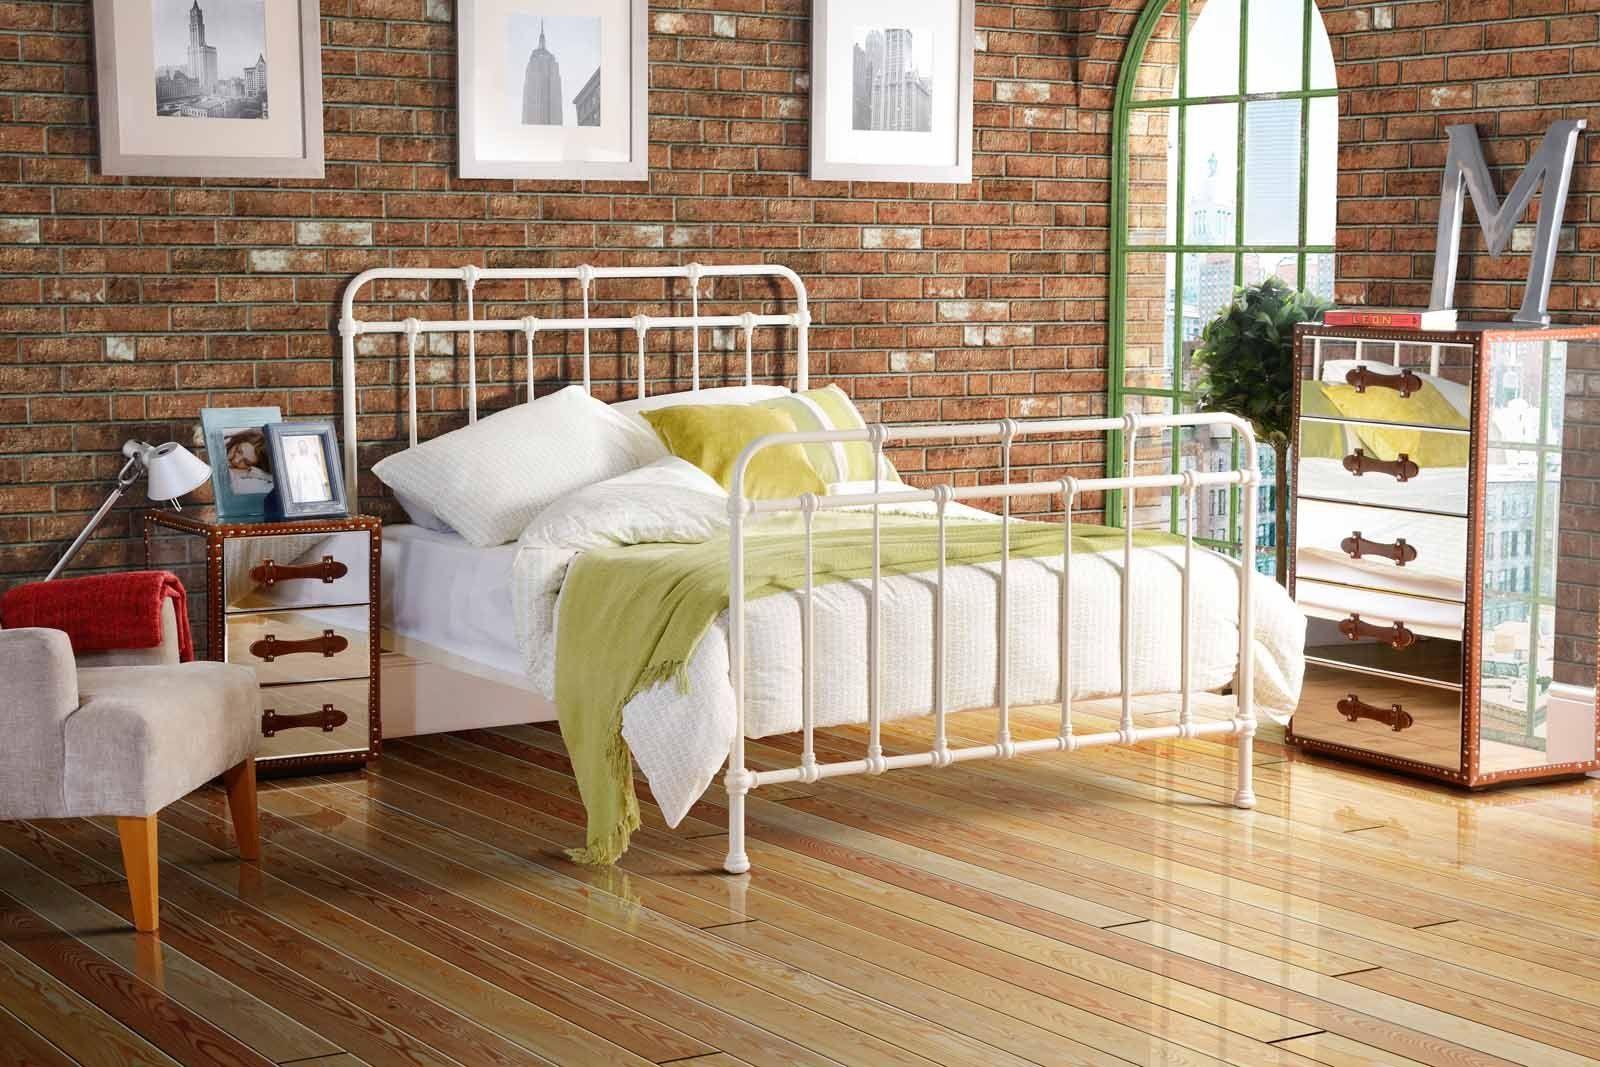 ISOBEL 5ft King size Dormitory style Vintage Iron Metal